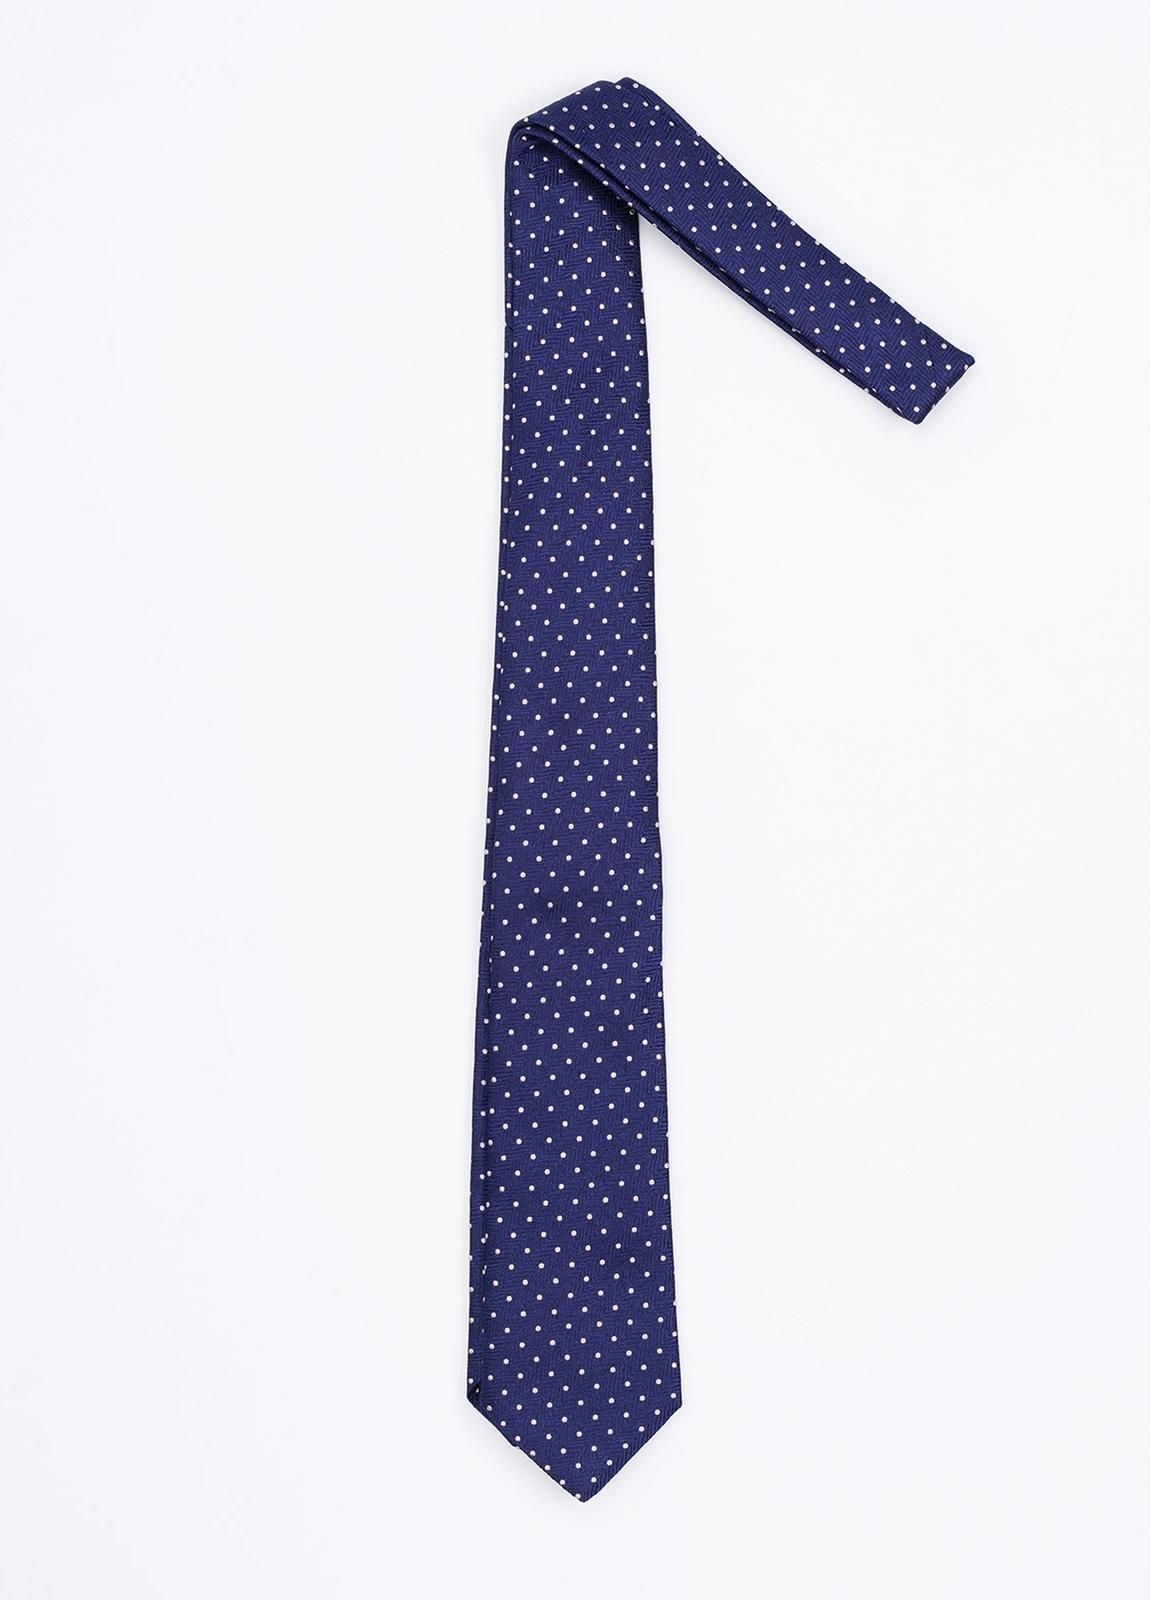 Corbata Formal Wear topitos, color azul. Pala 7,5 cm. 100% Seda. - Ítem1